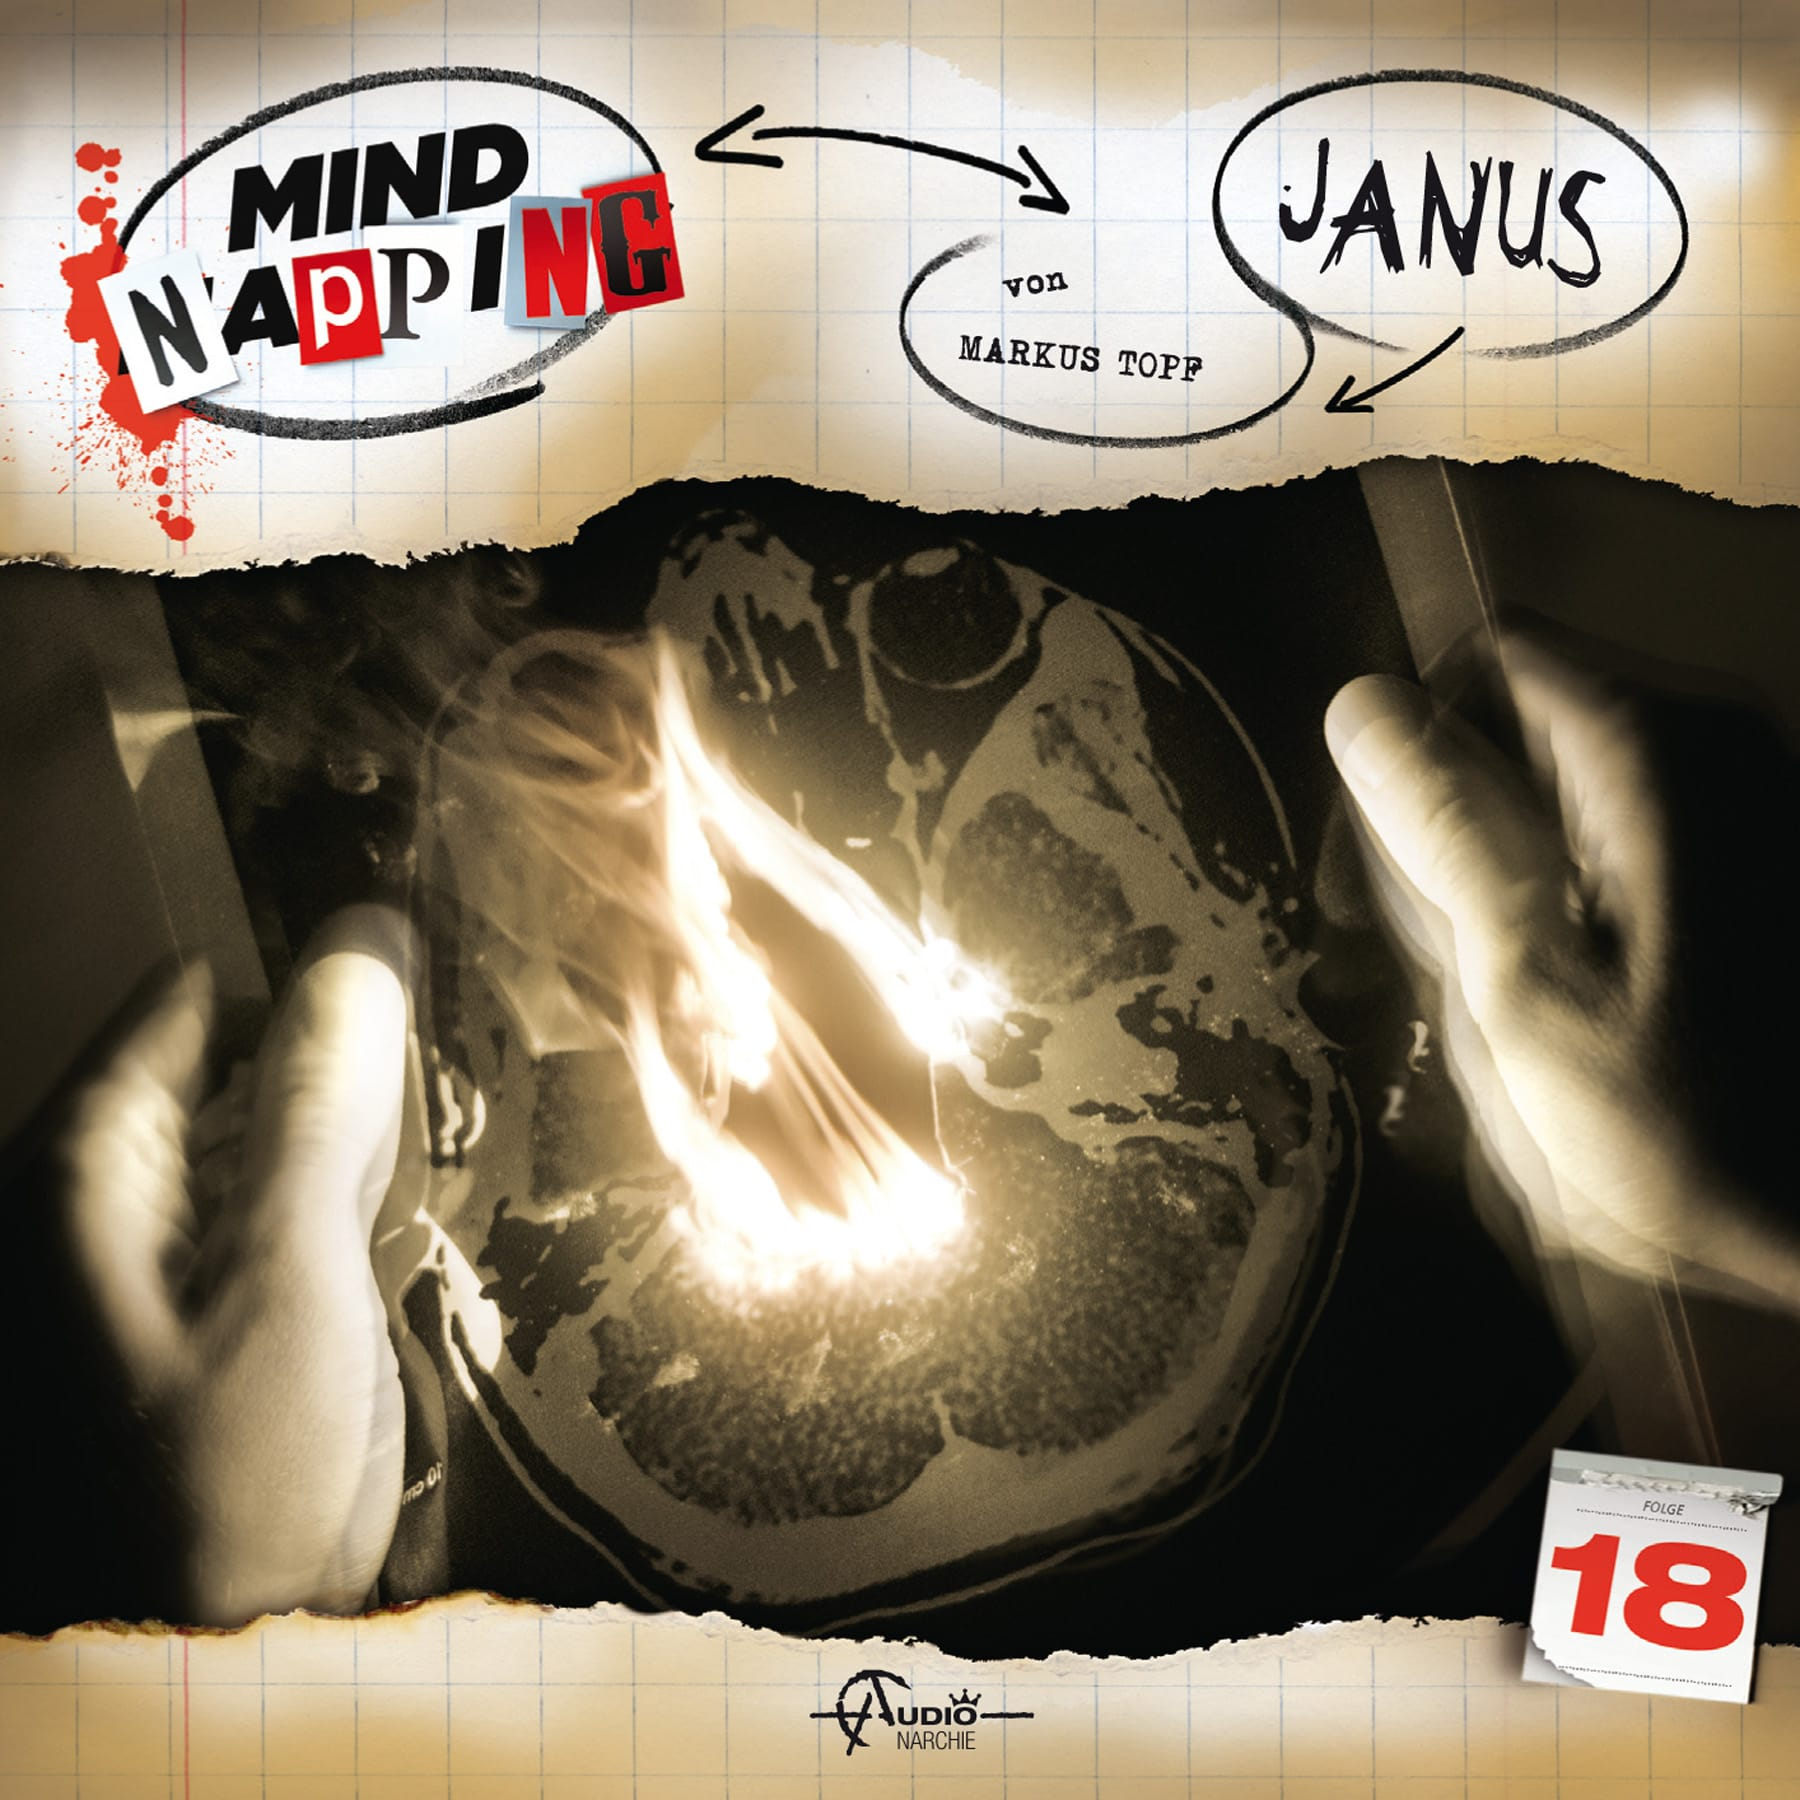 Mindnapping (18) – Janus